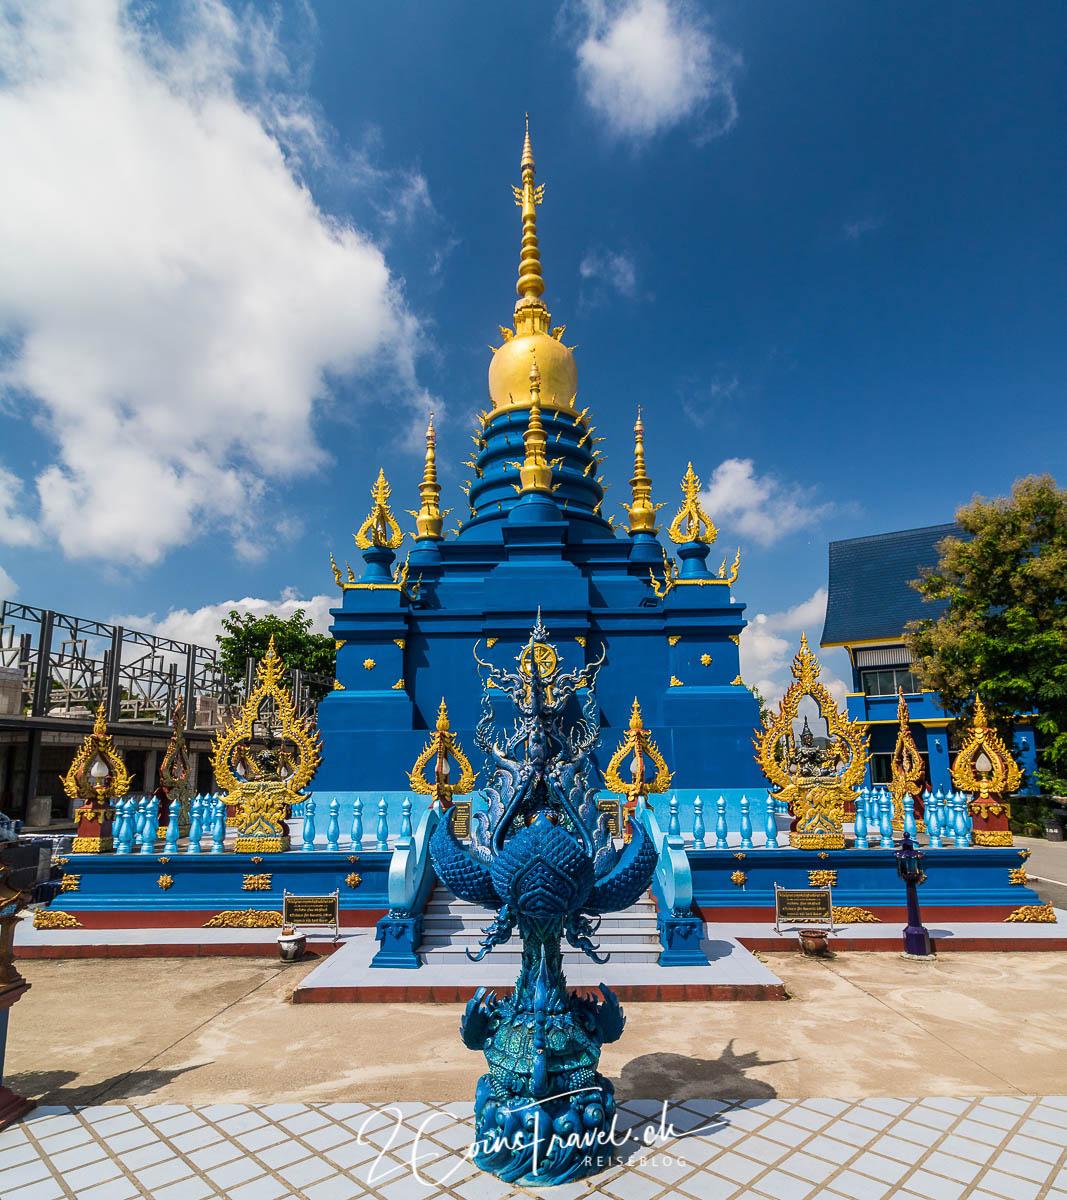 Tempelgebäude des blauen Tempels